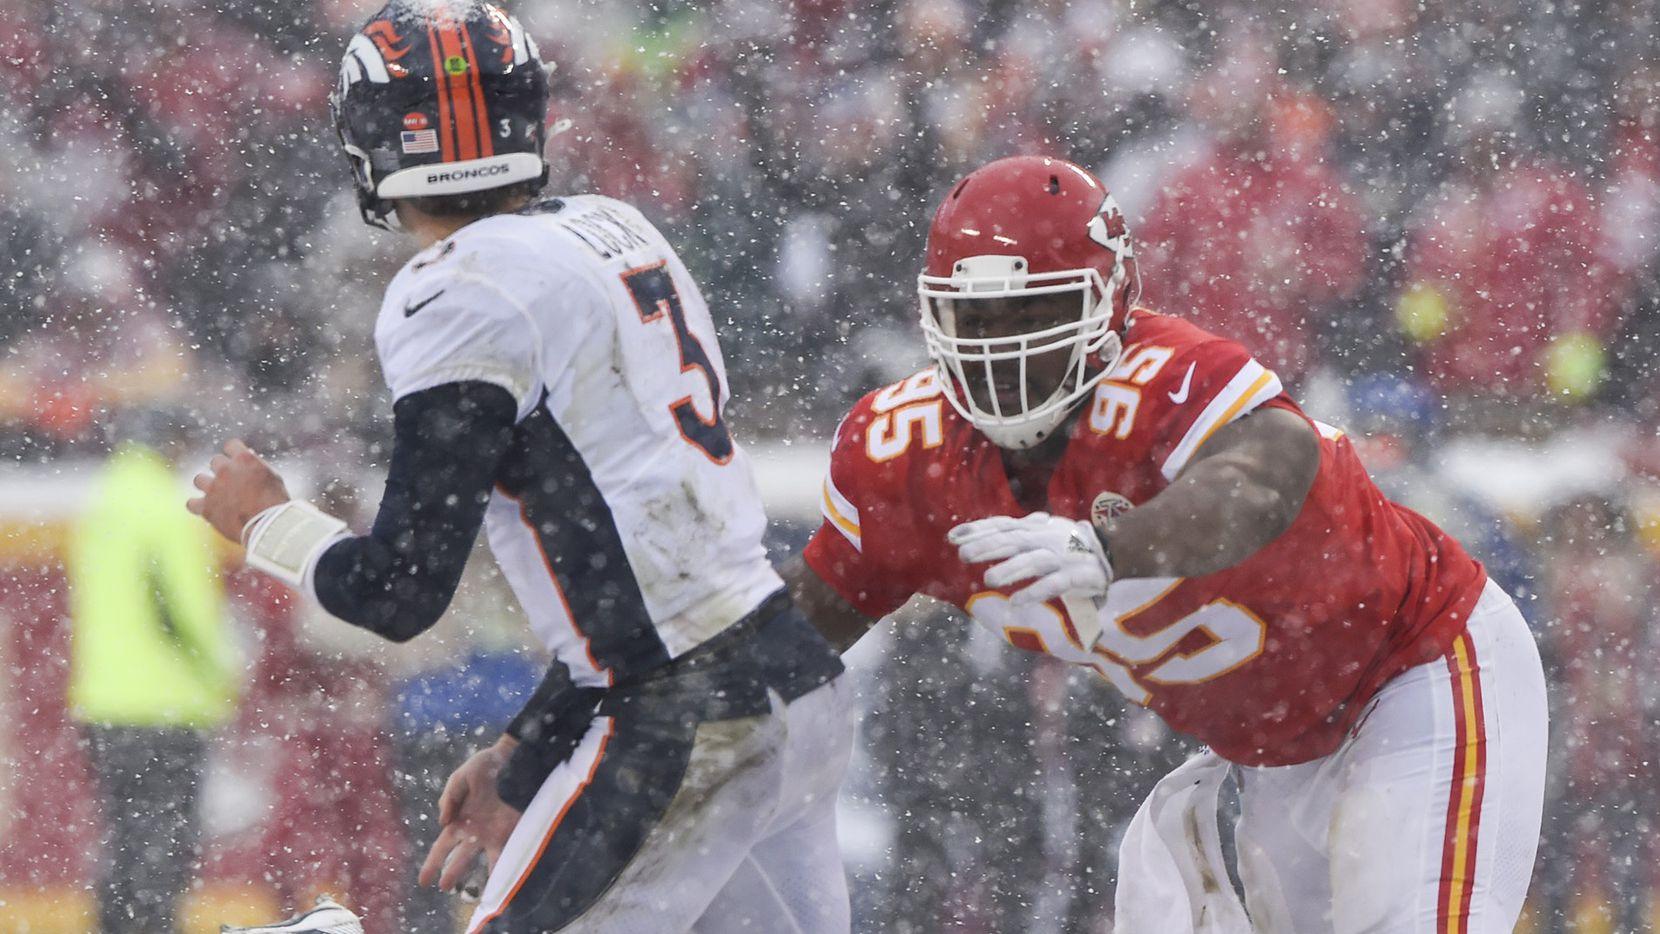 Kansas City Chiefs defensive end Chris Jones rushes Denver Broncos quarterback Drew Lock in the second half Sunday, Dec. 15, 2019 at Arrowhead Stadium in Kansas City, Mo. (Tammy Ljungblad/Kansas City Star/TNS)